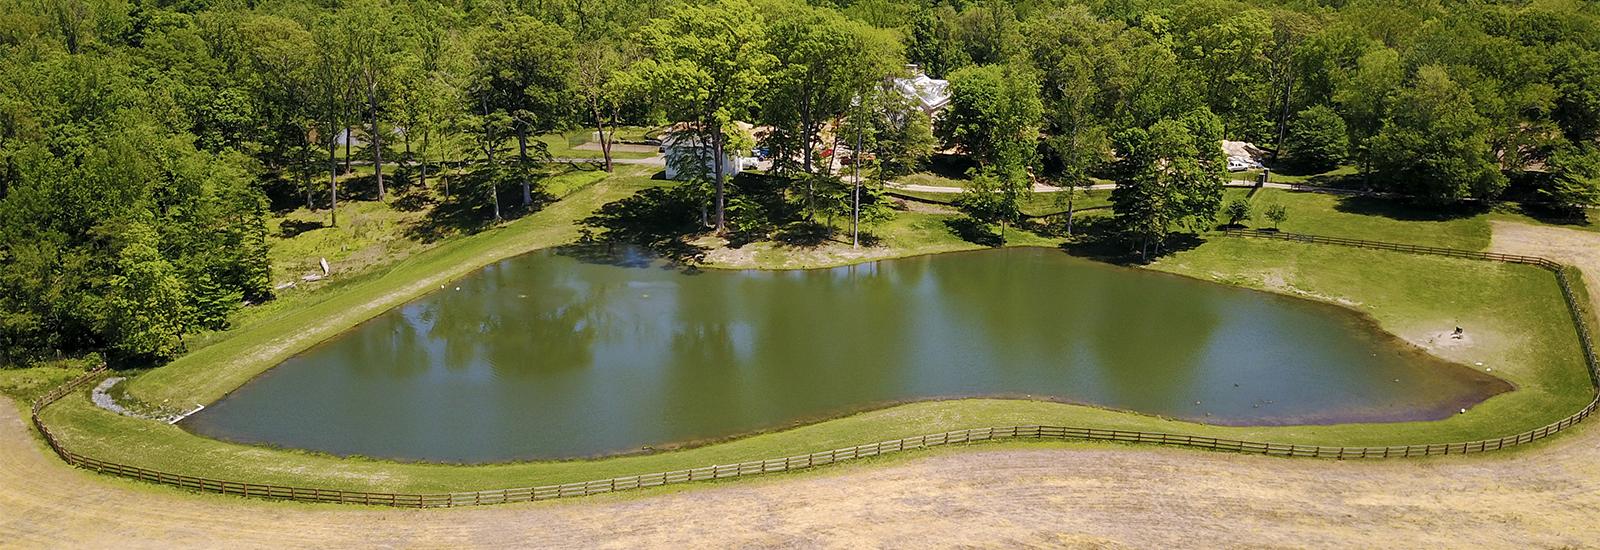 Chelsey Swan Pond